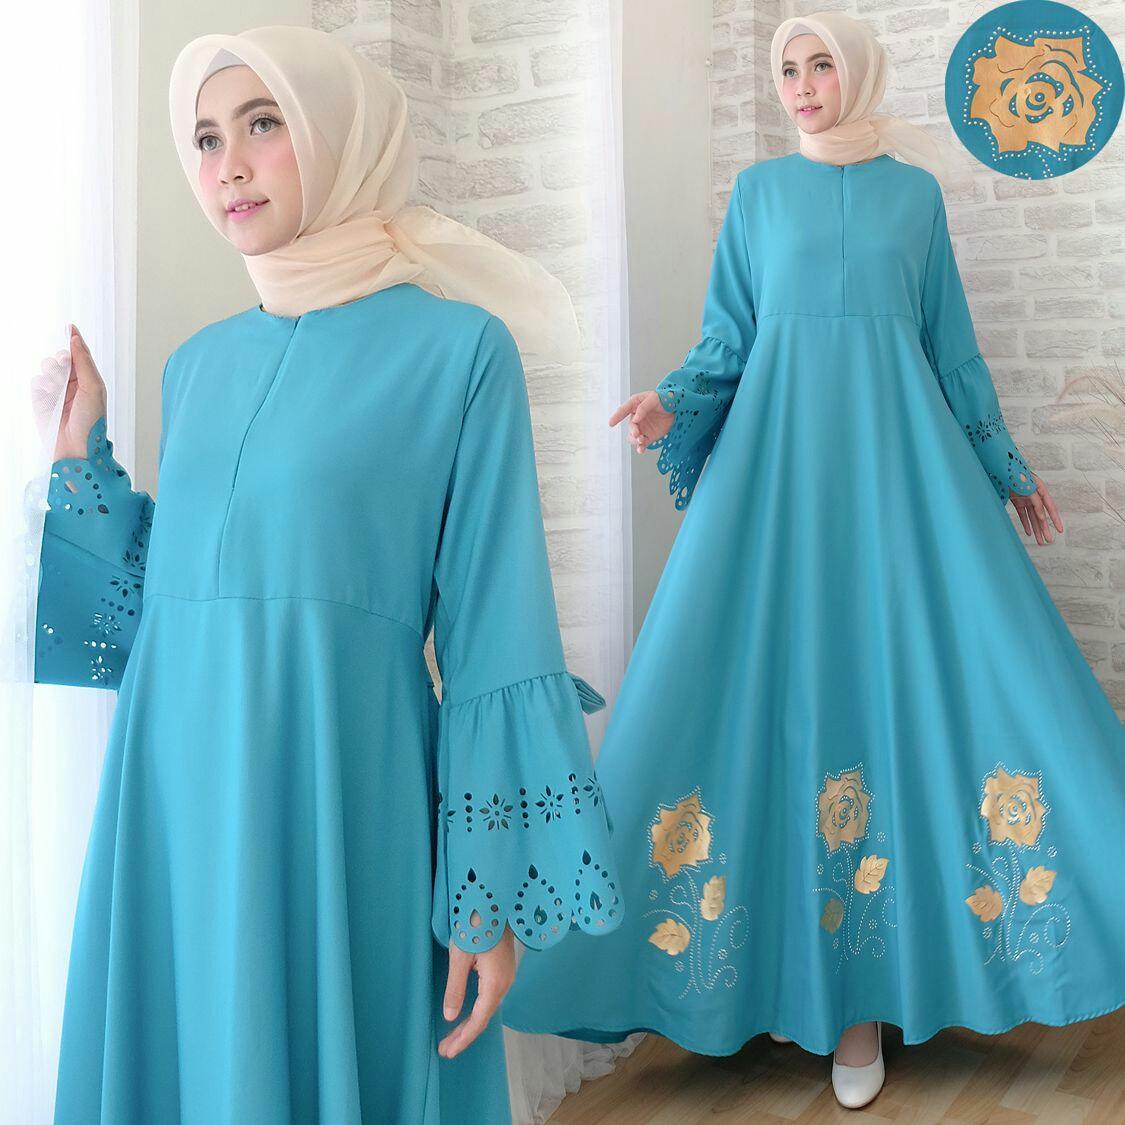 Snowshop Gamis Syari KaylaNew Colour - Baju Muslim / Fashion Wanita / Baju wanita / Baju Gamis / Busui / Gaun / Baloteli / XL / Jumbo / Syari